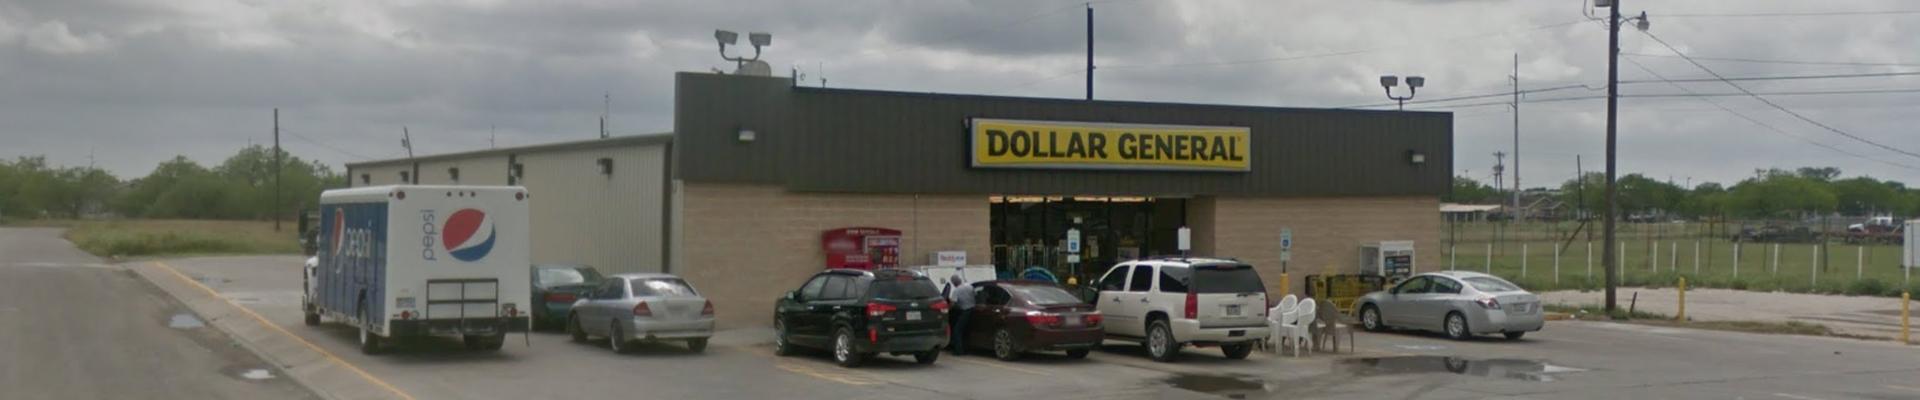 Dollar General (10488) – Orange Grove, Texas